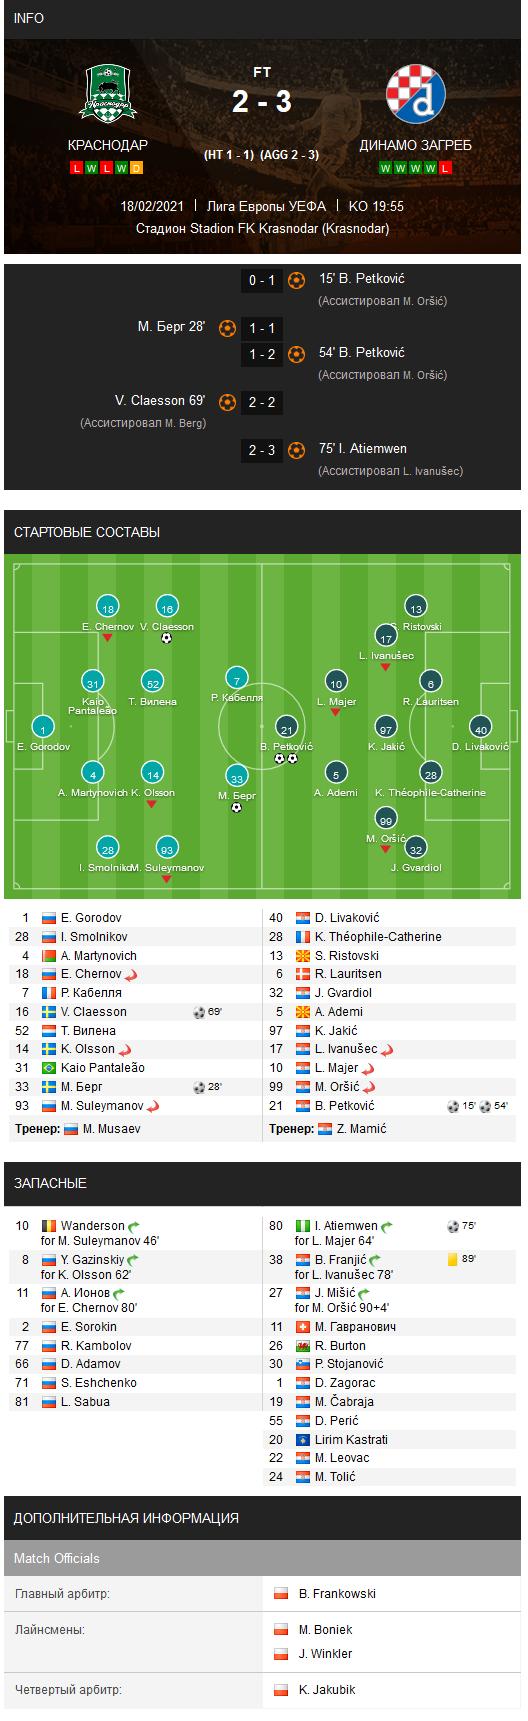 Краснодар (Россия) - Динамо Загреб (Хорватия) 2:3